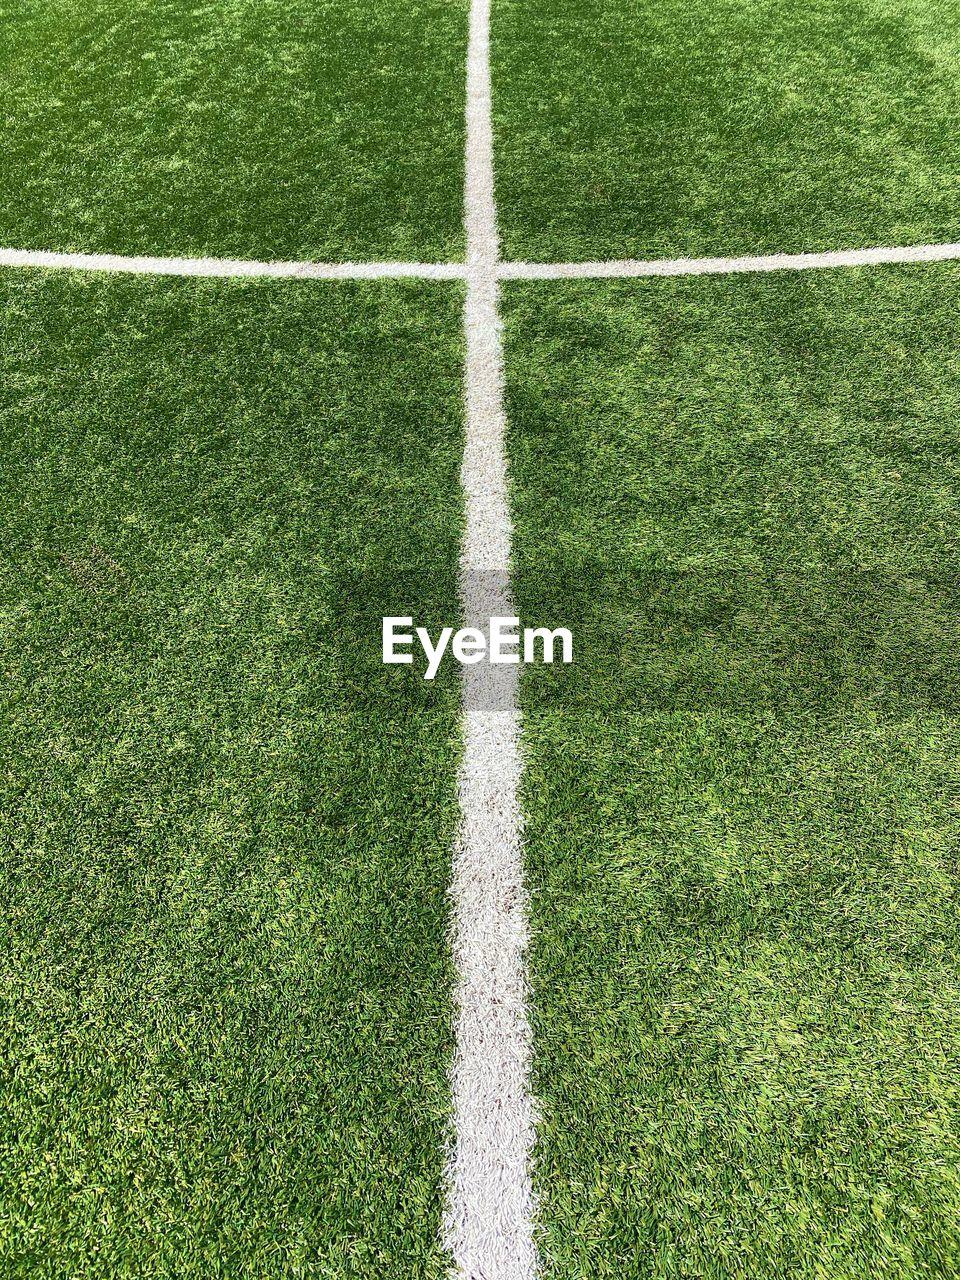 Chalk lines on a soccer field